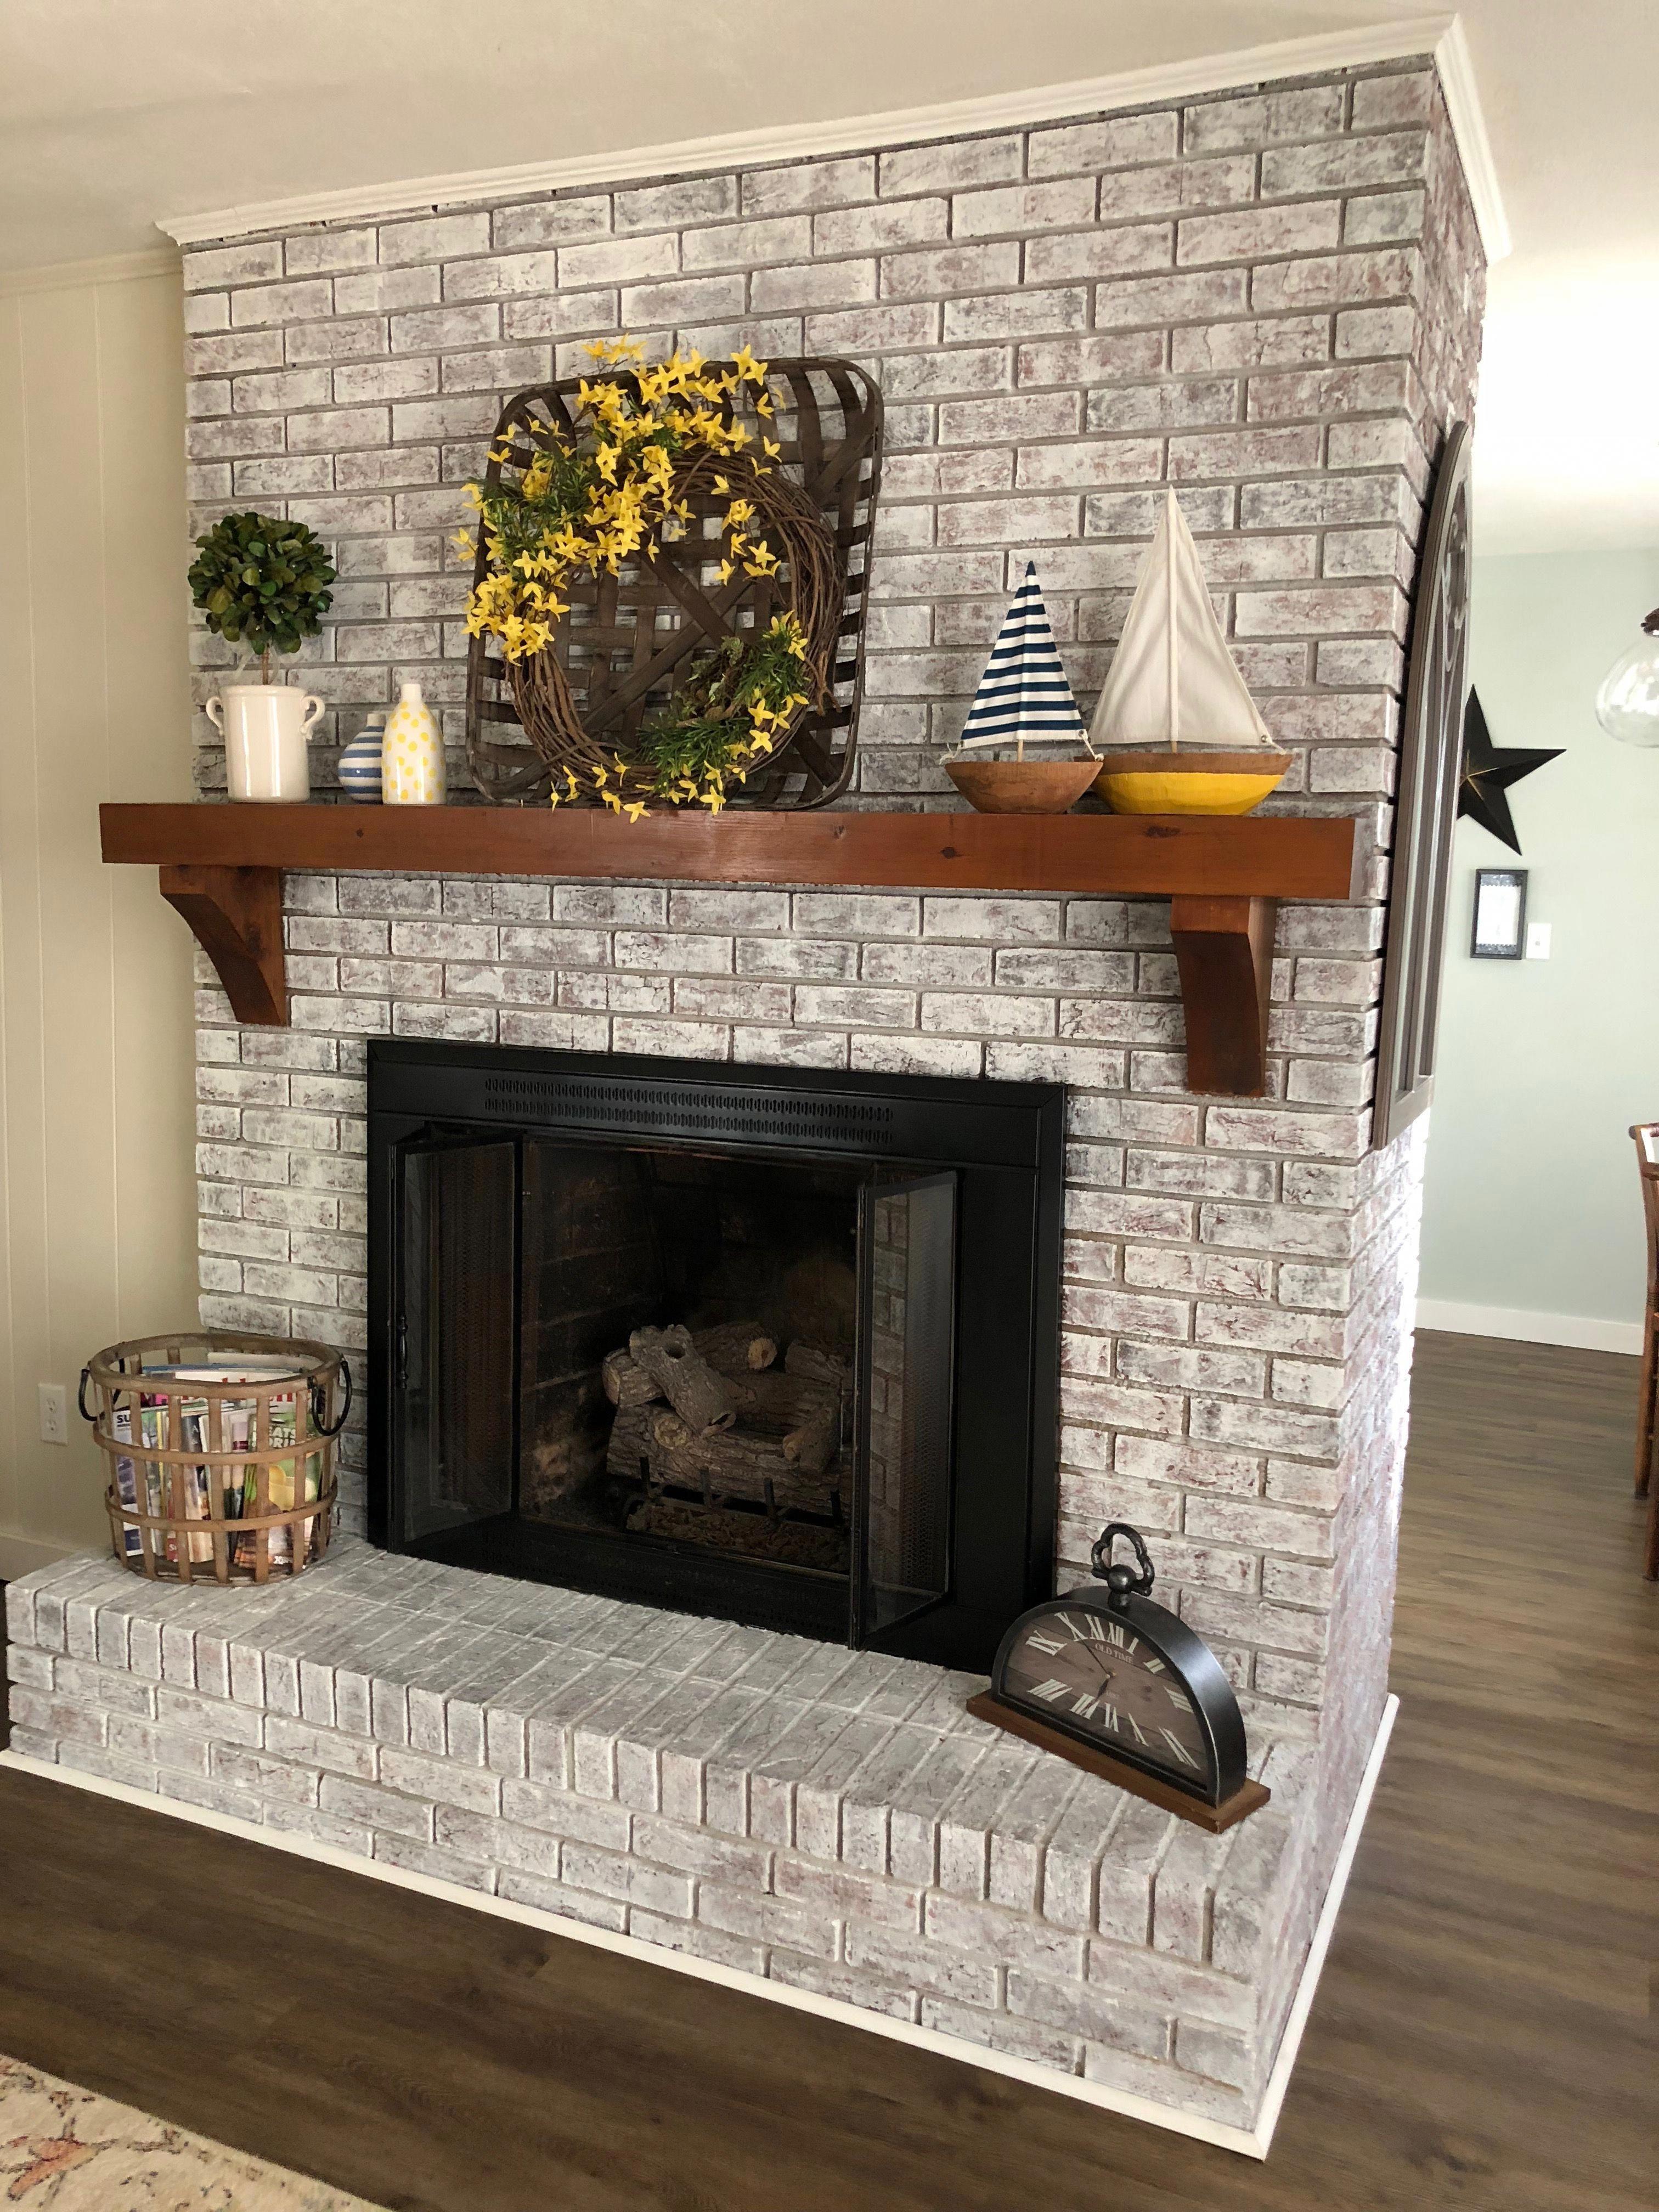 How to Paint A Brick Fireplace White Elegant Painted Brick Fireplace Sw Pure White Over Dark Red Brick